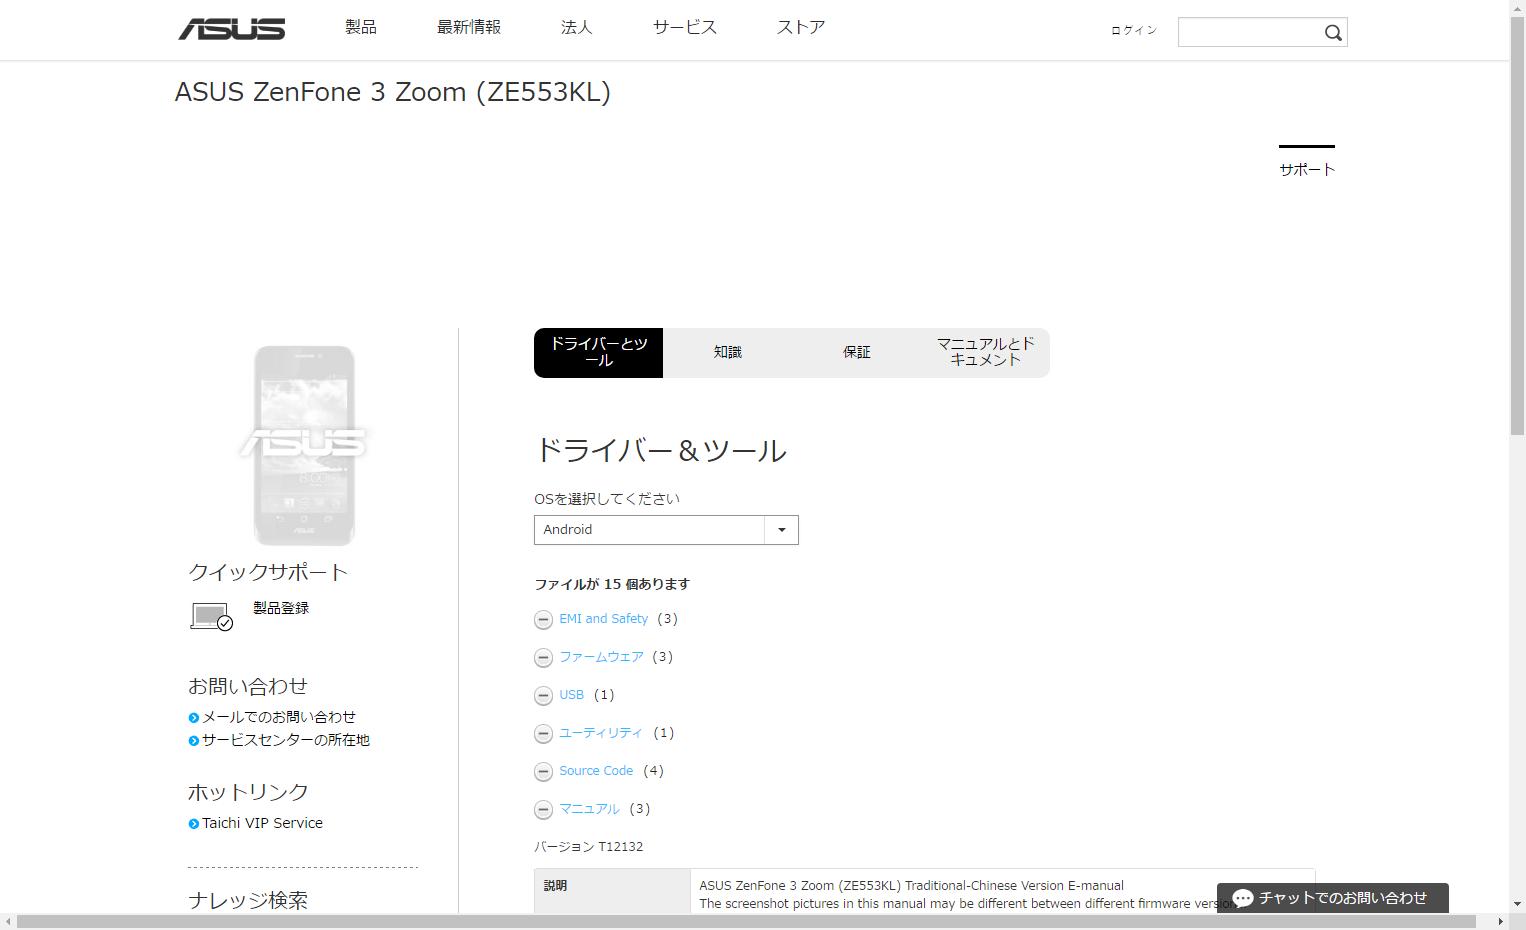 ZenFone AR ZS571KLの日本語マニュアルが公開されていた! : ASUS好きの